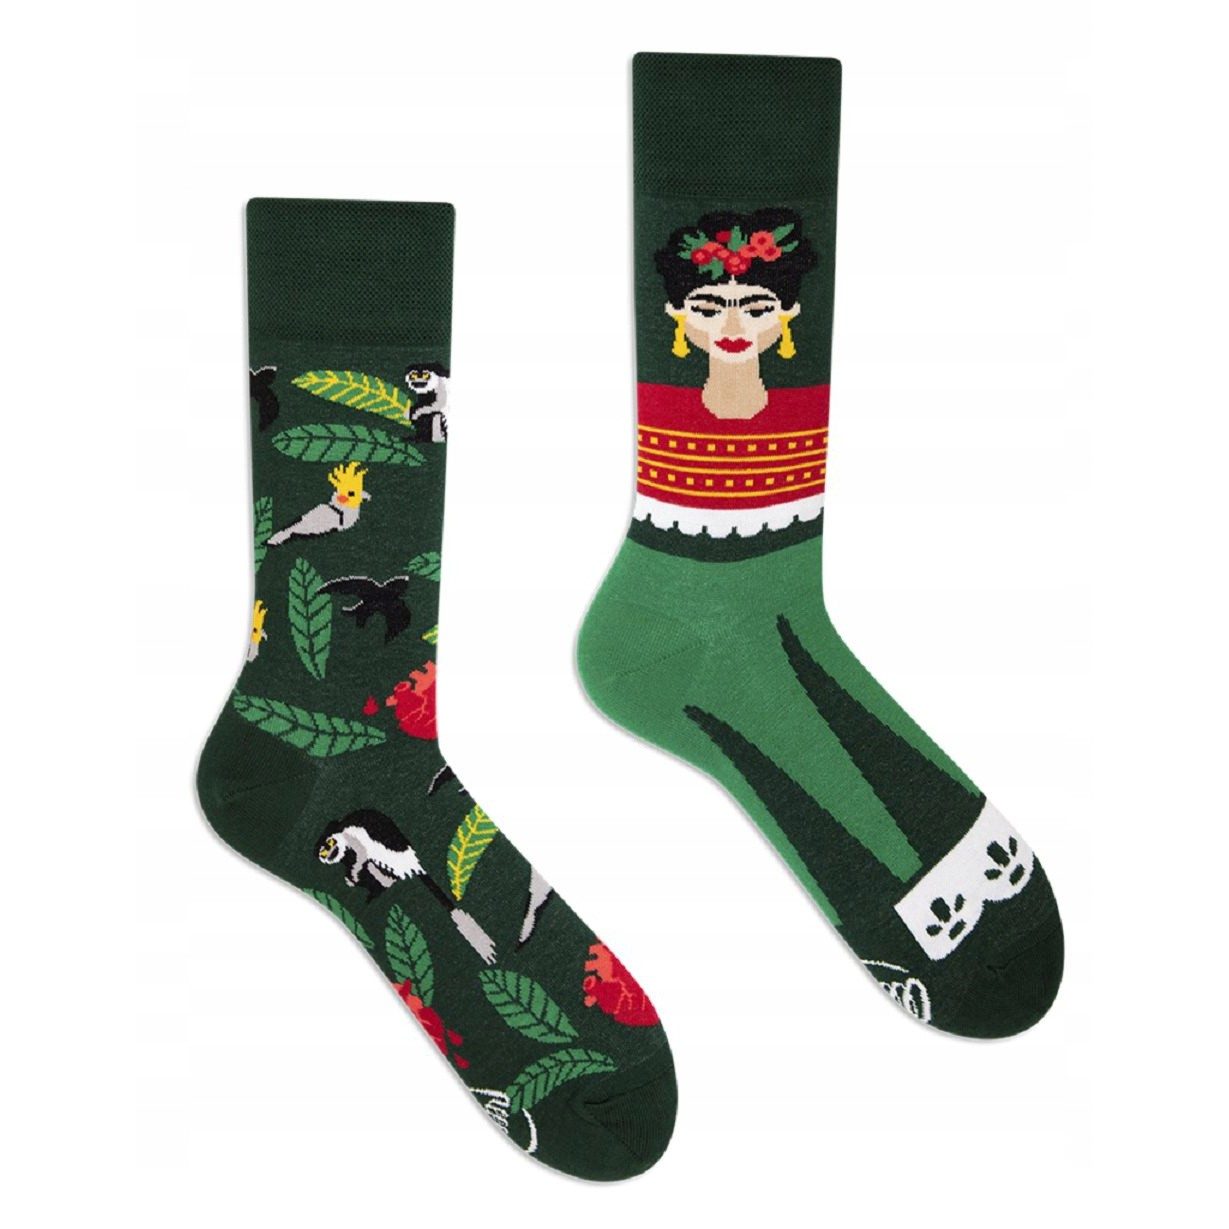 veselé ponožky FEEL FRIDA zelené 39-42 farebné megamix.sk